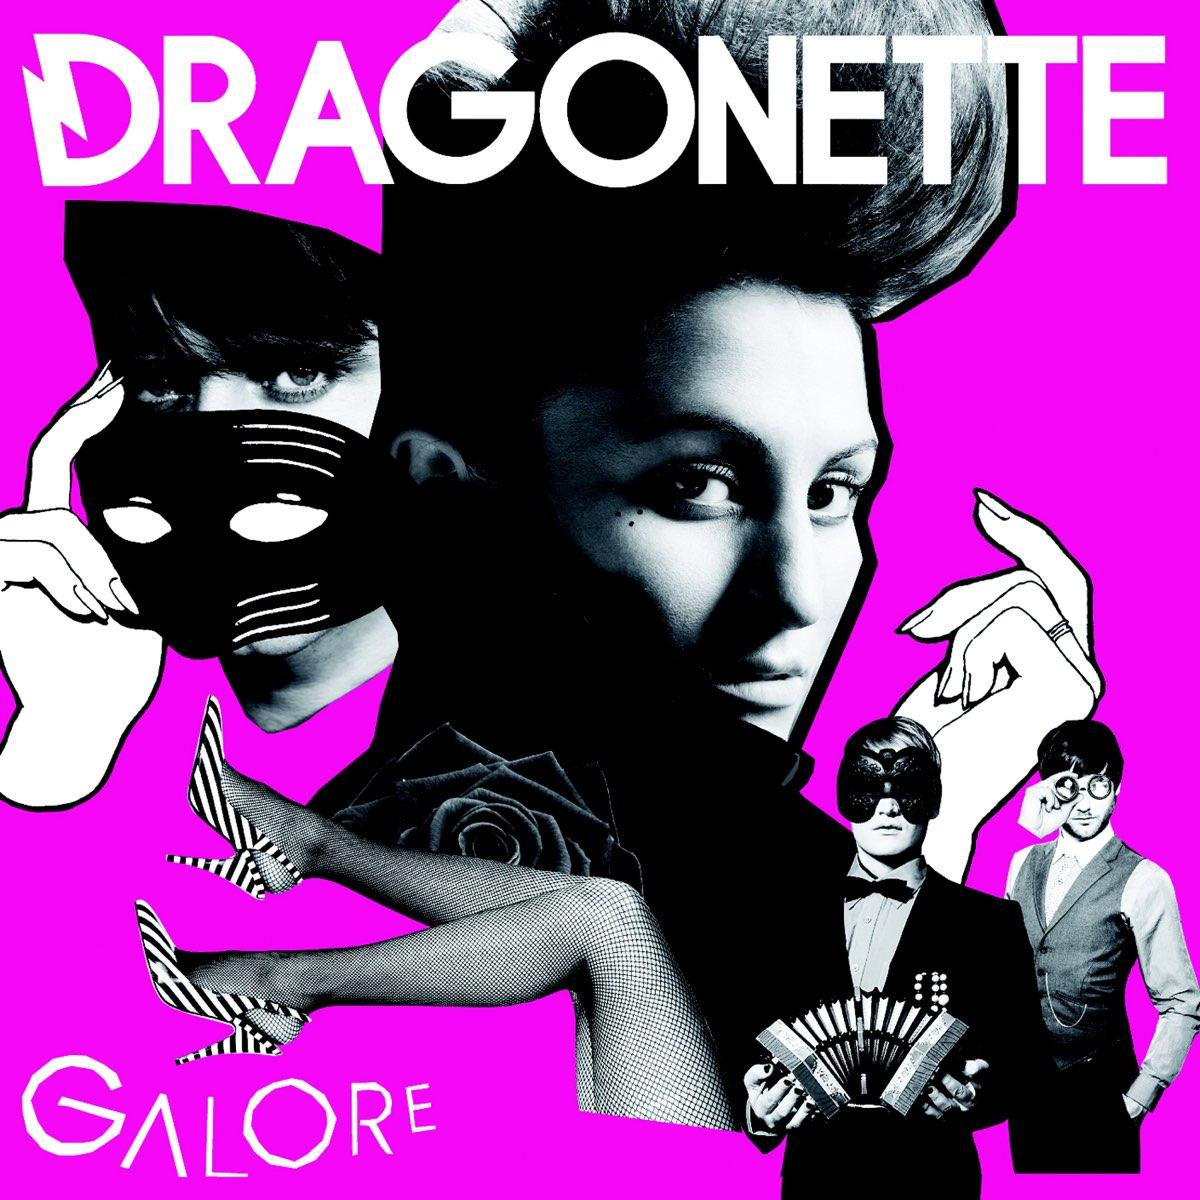 Dragonette, Galore